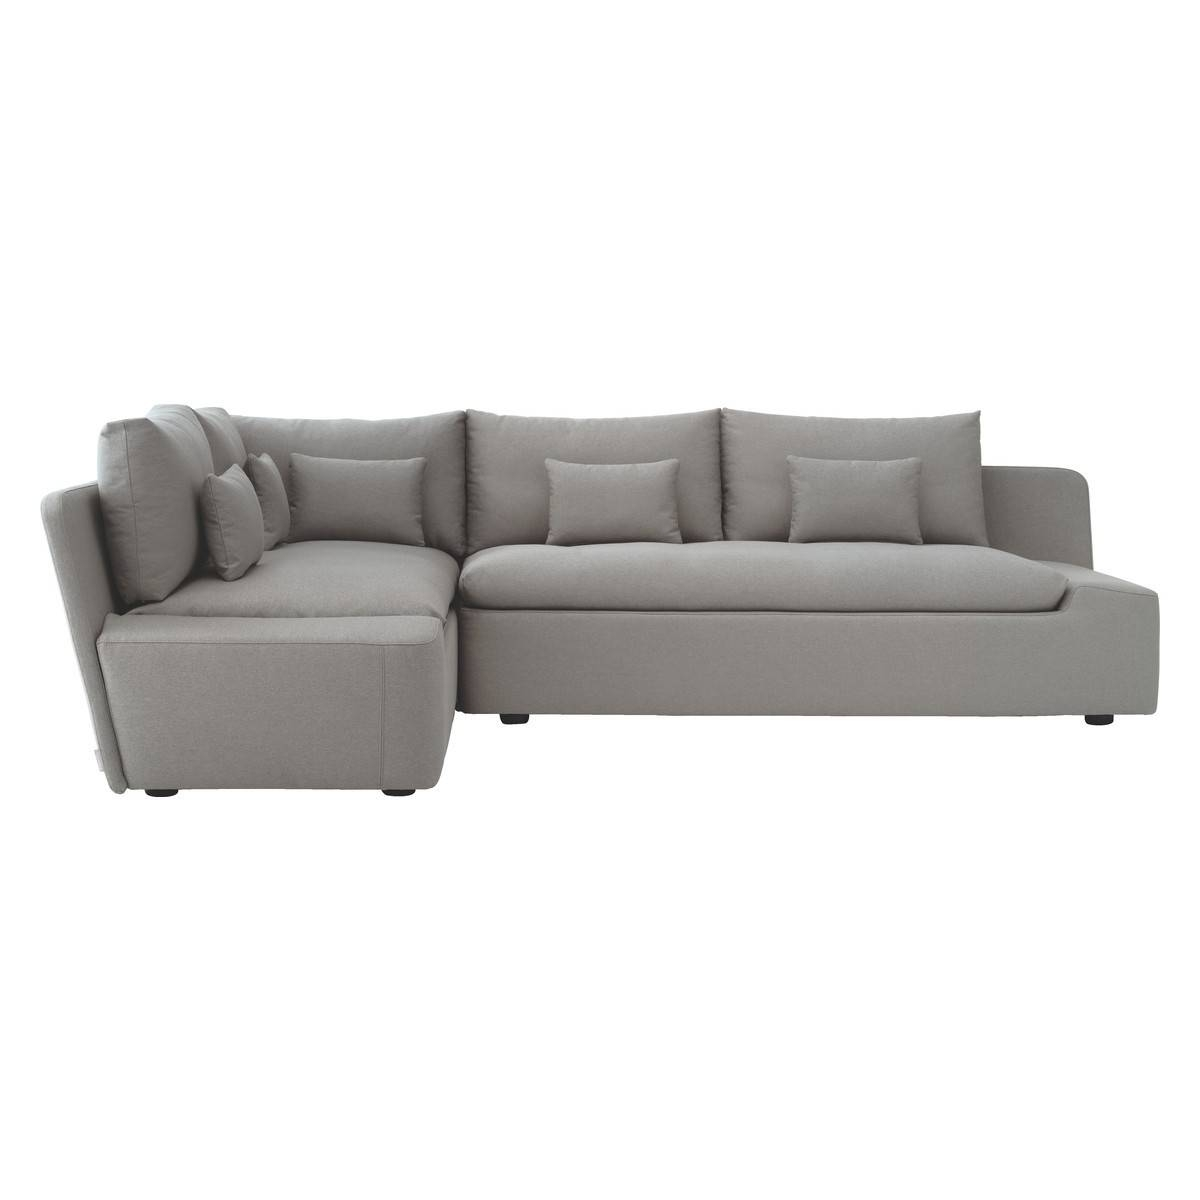 Kasha Light Grey Textured Fabric Right-Arm Corner Sofa | Buy Now regarding 2X2 Corner Sofas (Image 17 of 30)